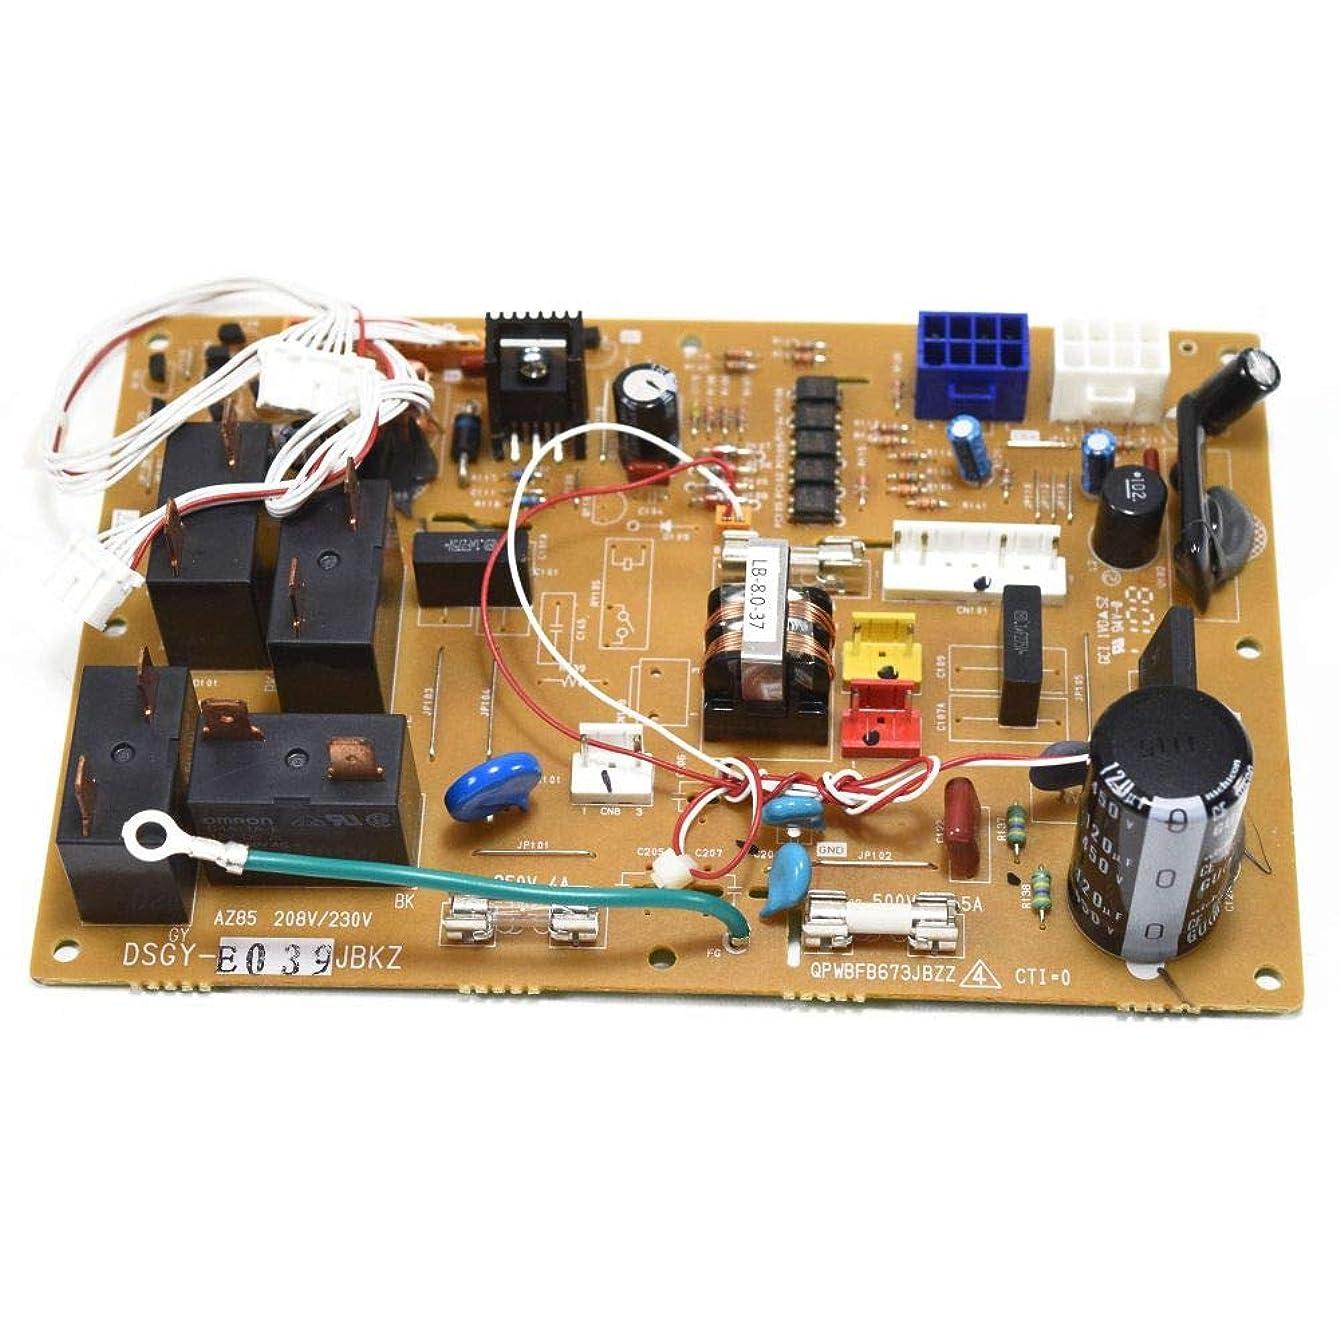 Ge W29X10033 Room Air Conditioner Fan Control Board Genuine Original Equipment Manufacturer (OEM) Part